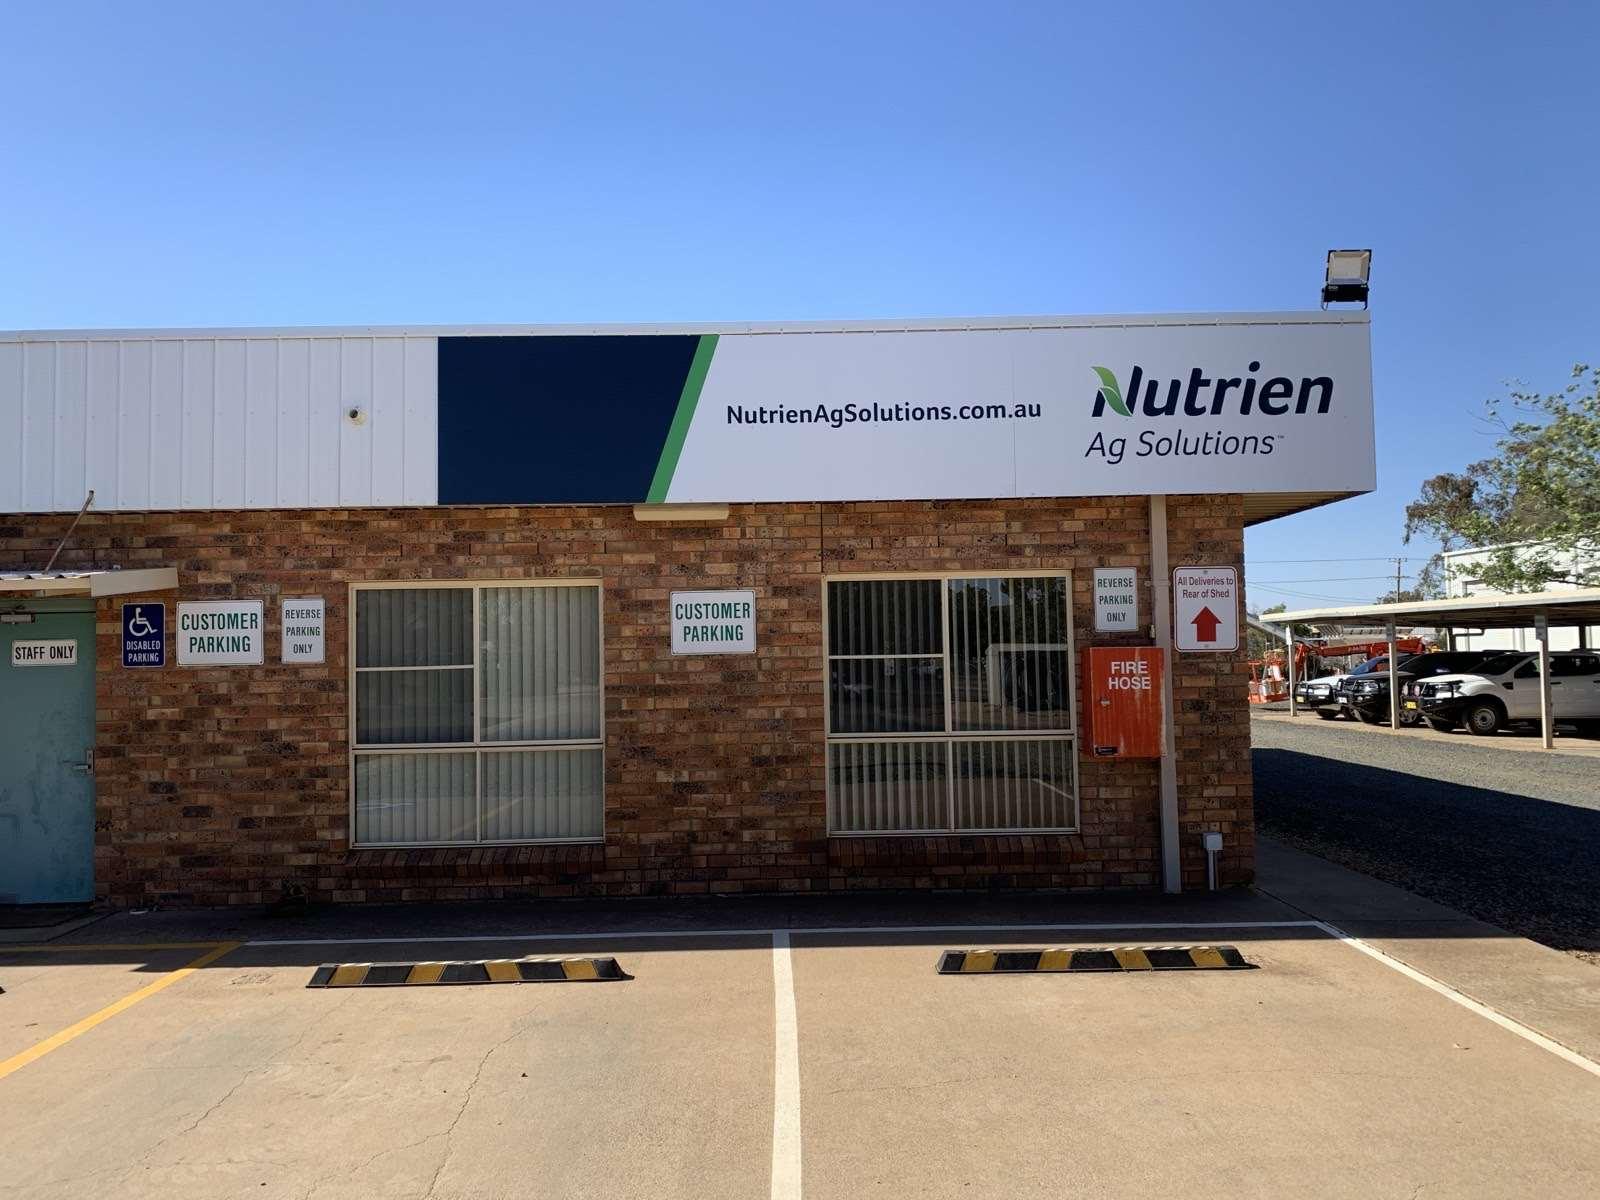 Nutrien Ag Solutions - Gunnedah, NSW 2380 - (02) 6741 9000 | ShowMeLocal.com